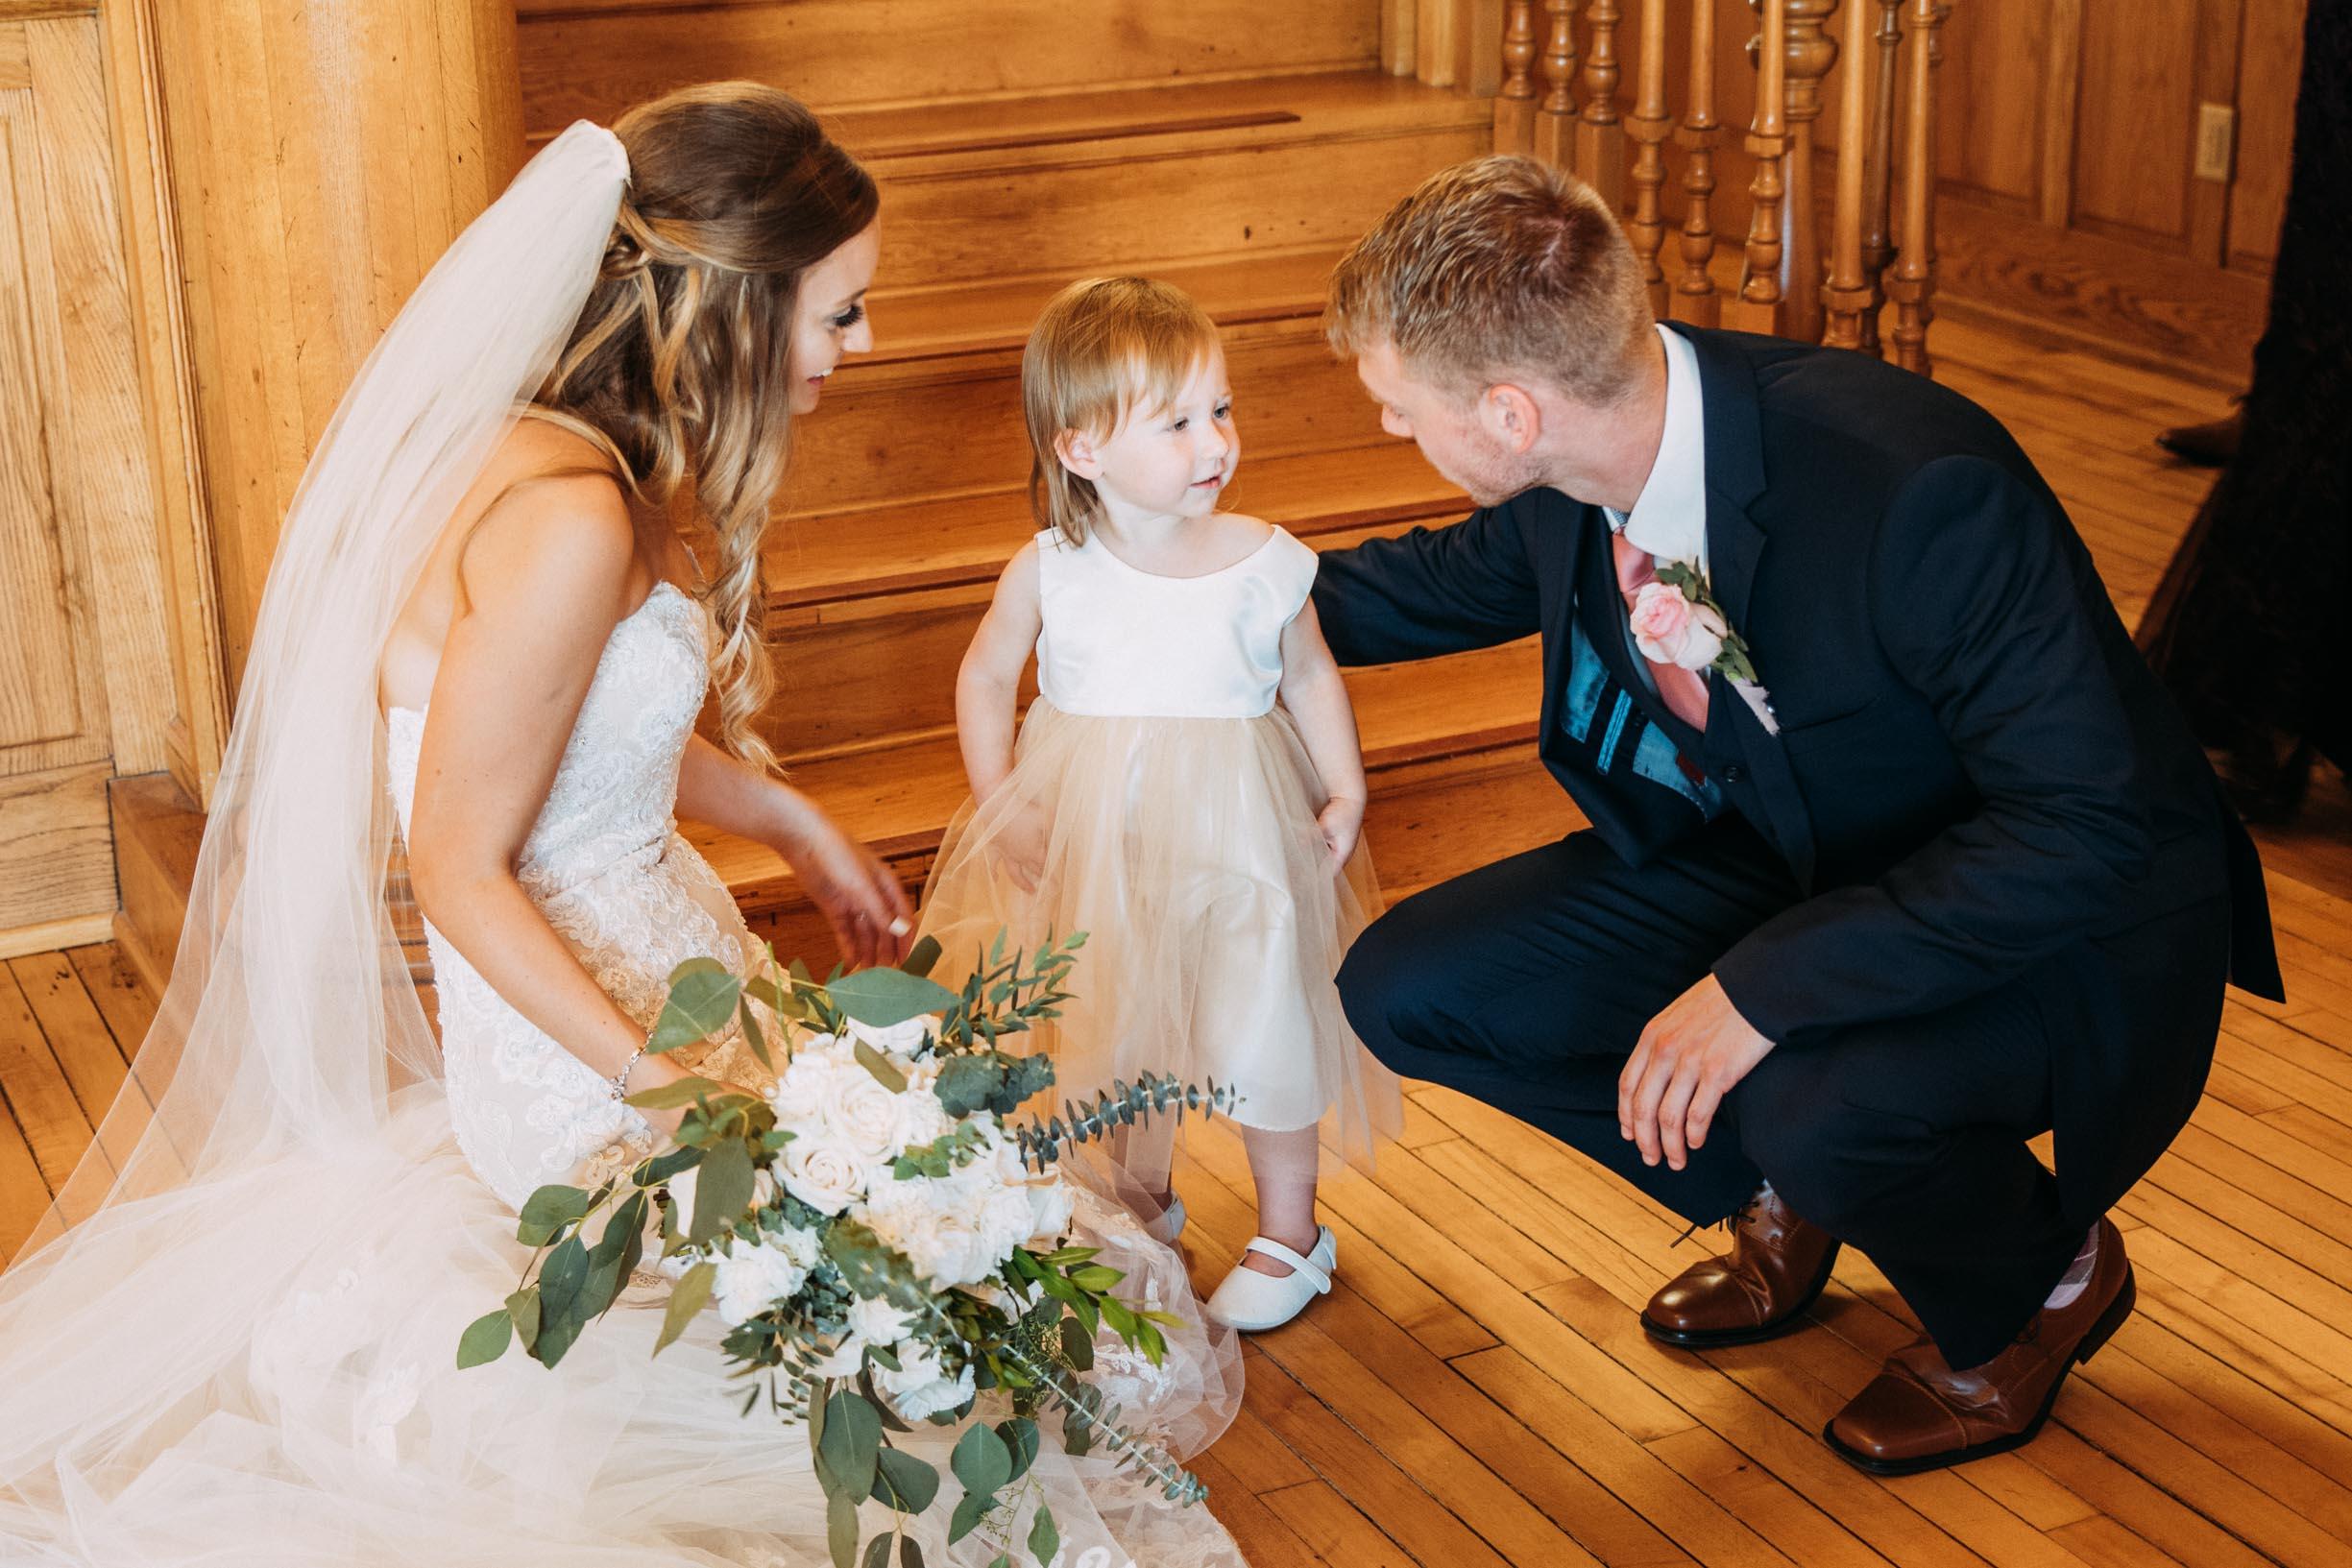 37-WeddingsattheBroz_Minnesota_WeddingBlog.jpg